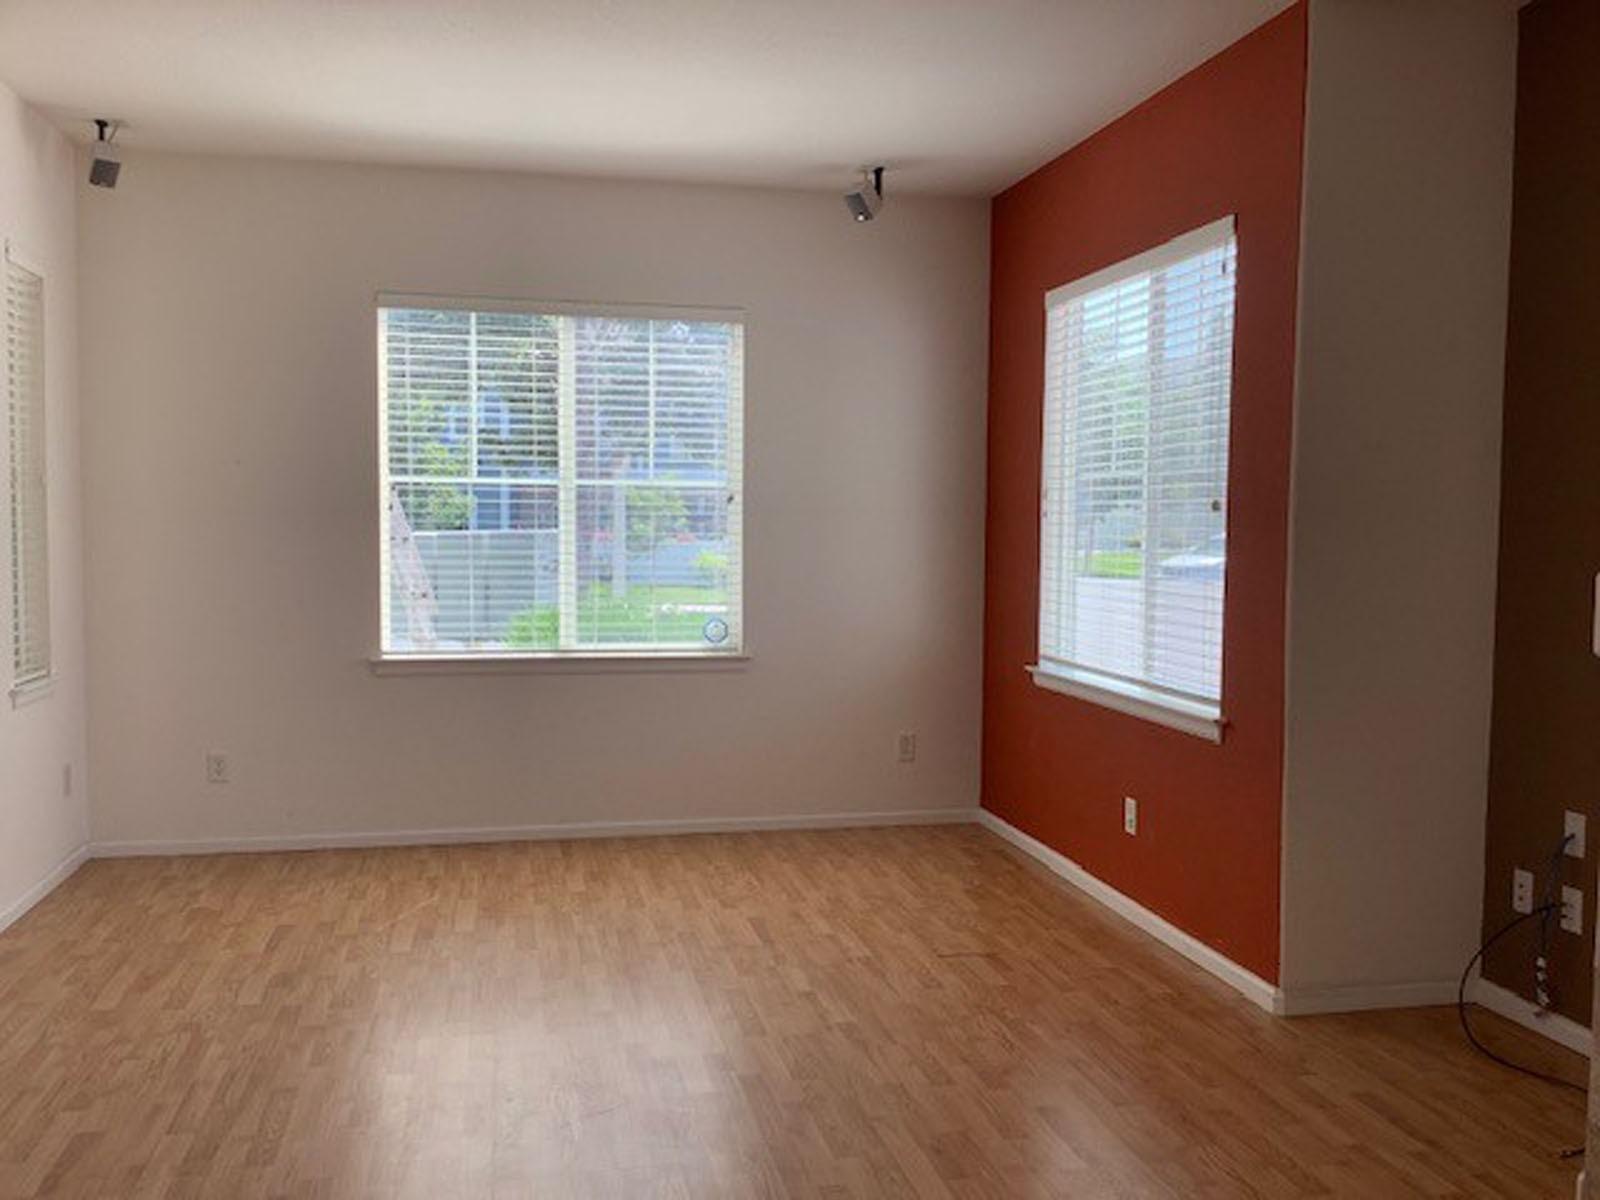 Nice Sized Living Room